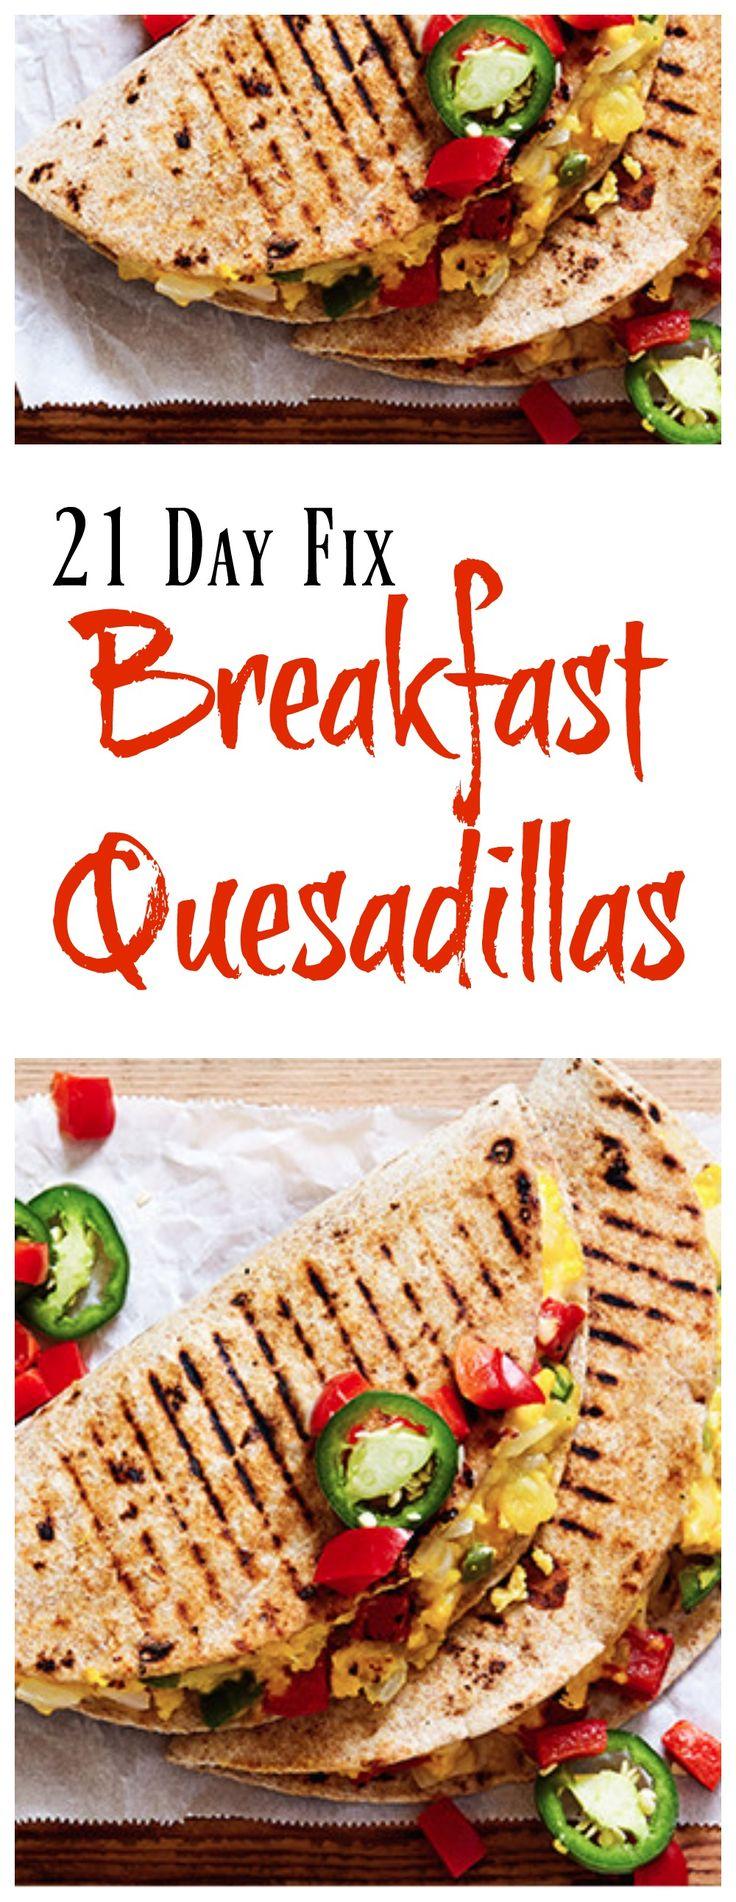 21 Day Fix Breakfast Quesadillas 1 Quesadilla/serving 1 1/2 Yellow 1/2 Green 1/2 Red 1/2 Blue 1/2 tsp